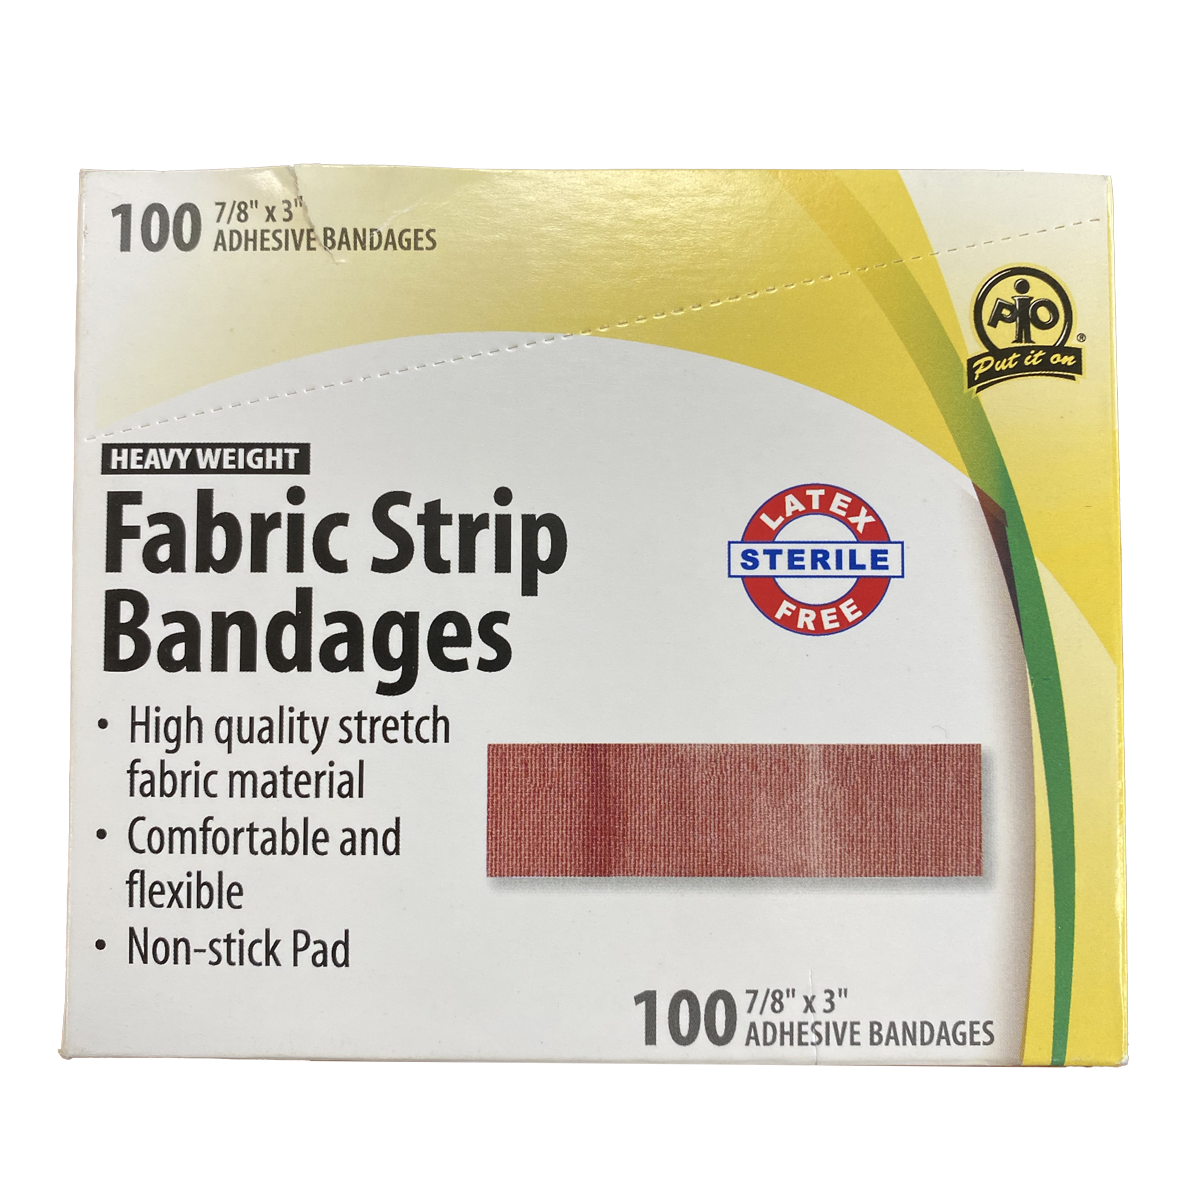 Fabric strip bandages